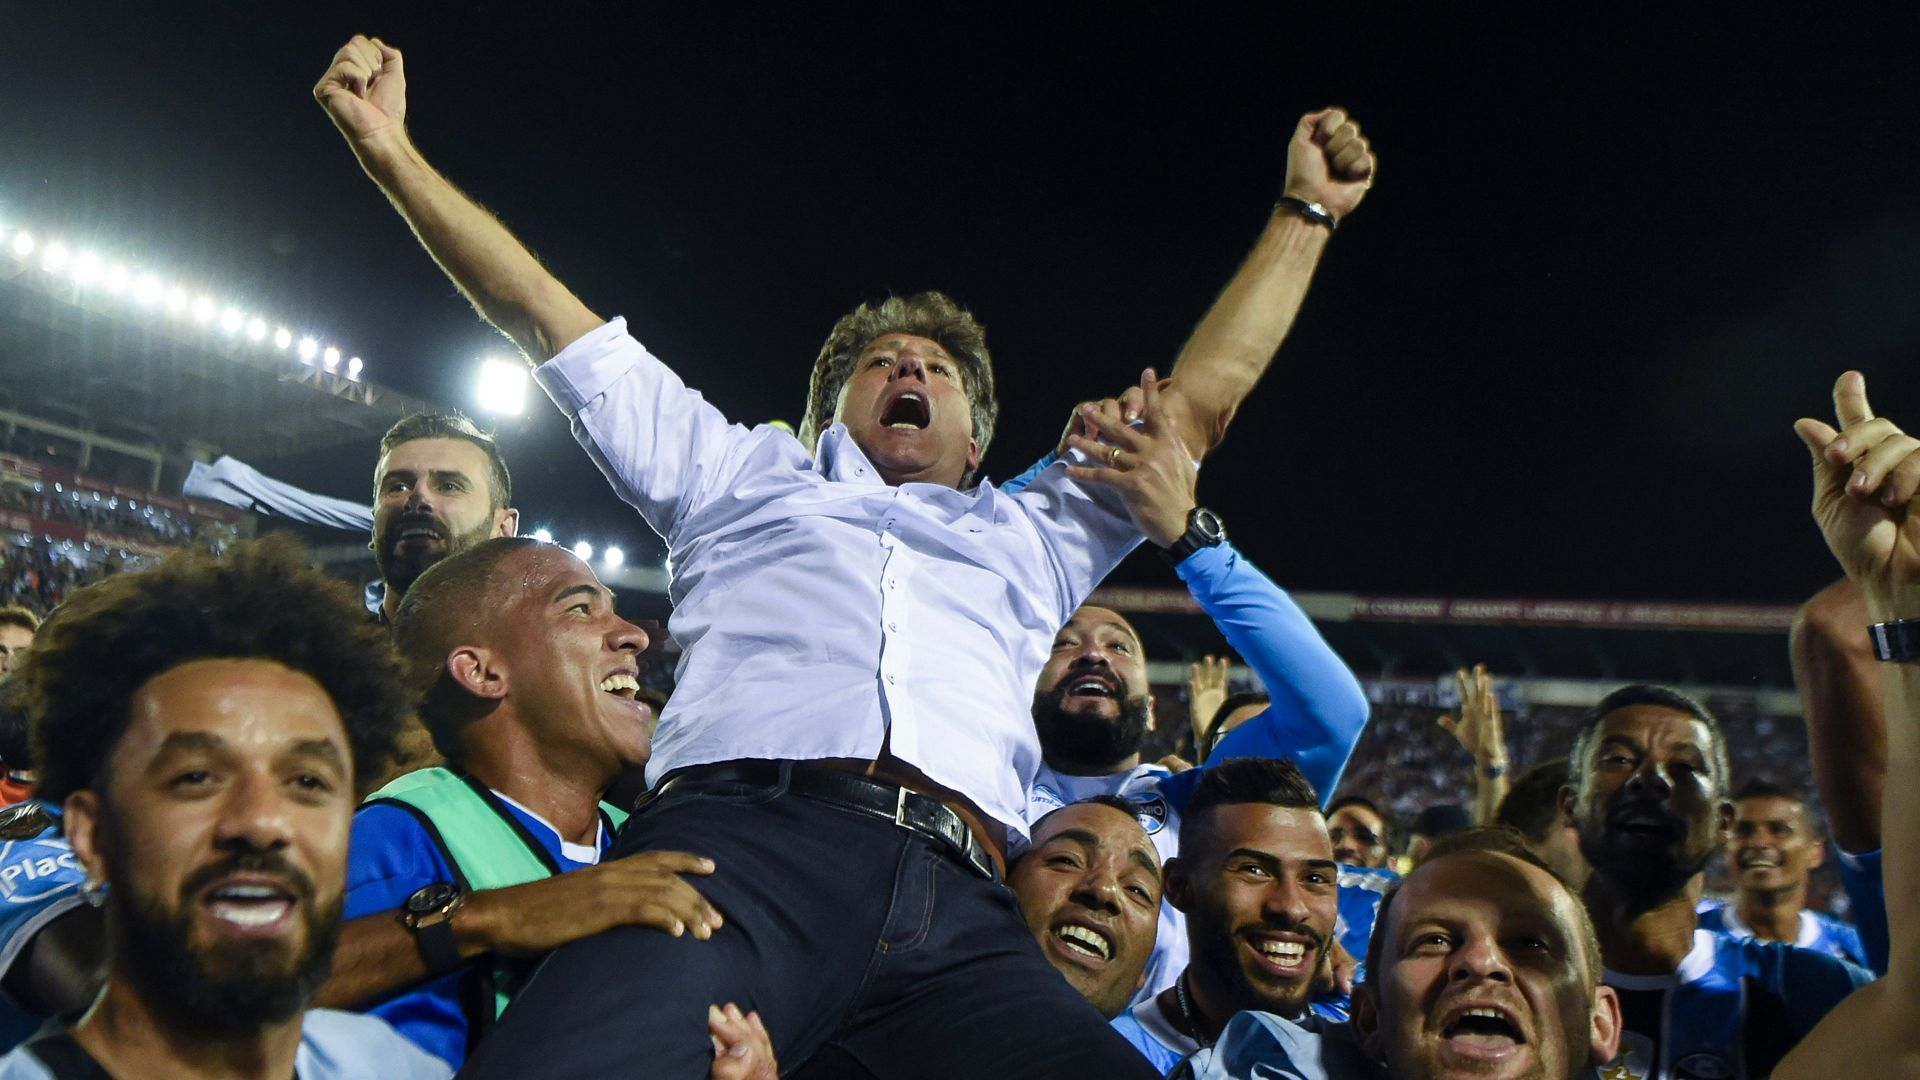 Vantagem brasileira na final da Libertadores — Lanús-Grêmio